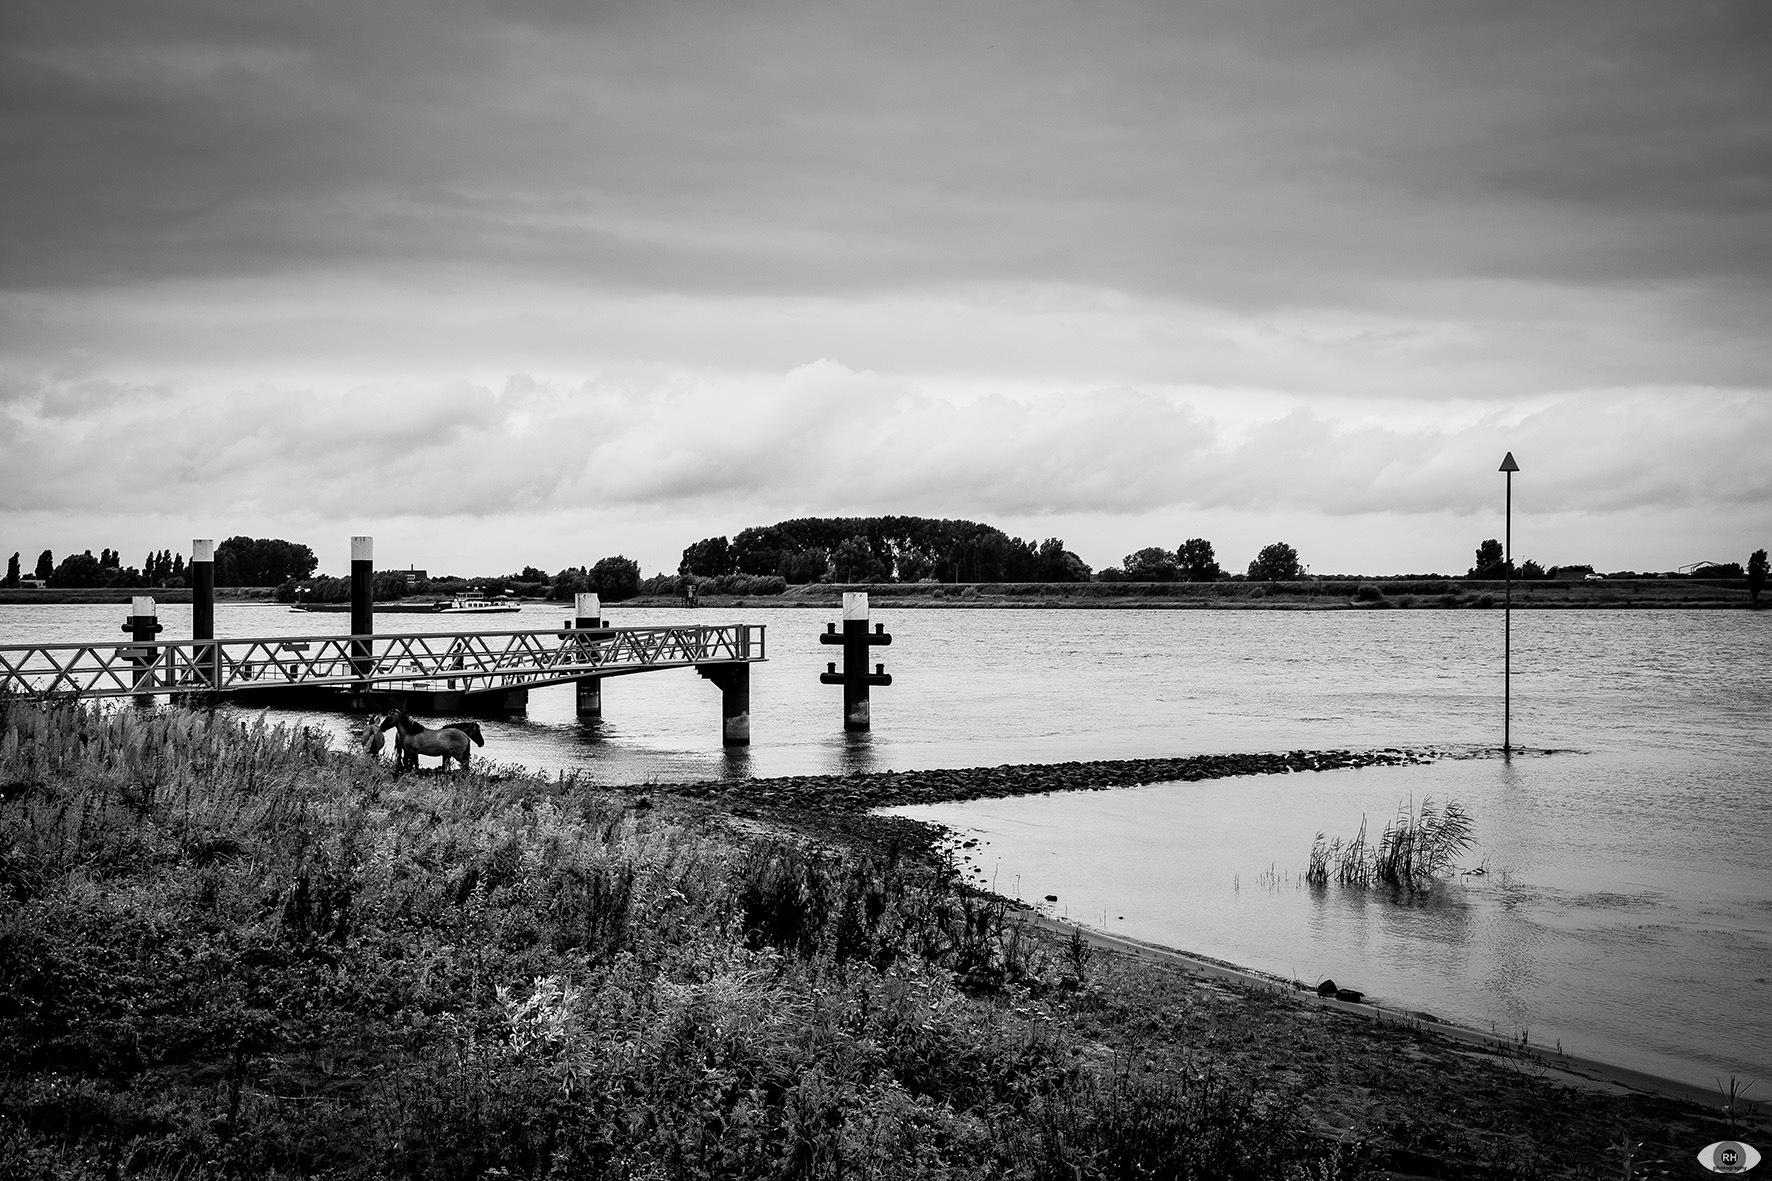 Poederoijen Netherlands (2) by ⭐ rhphotography